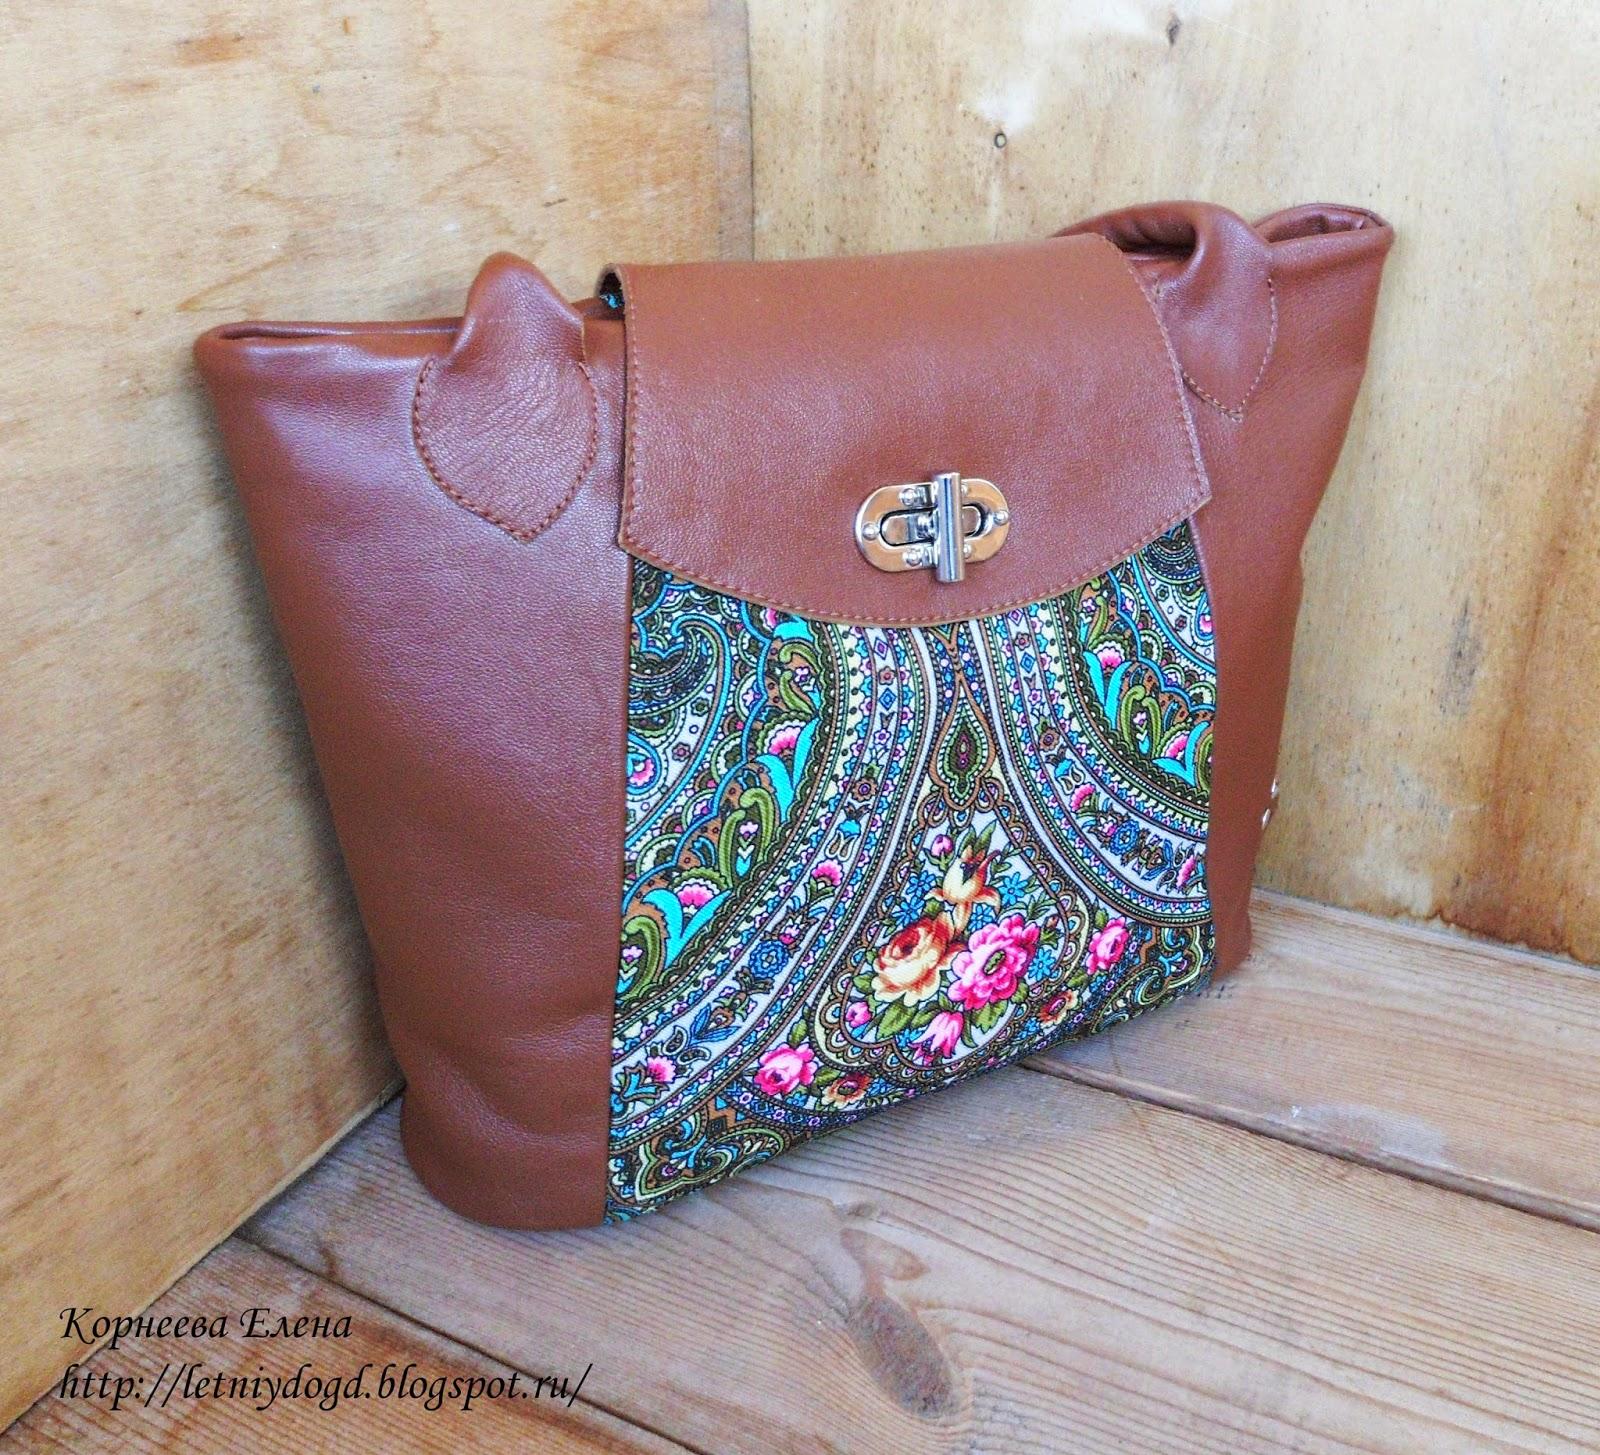 кожаная рыжая женская сумка